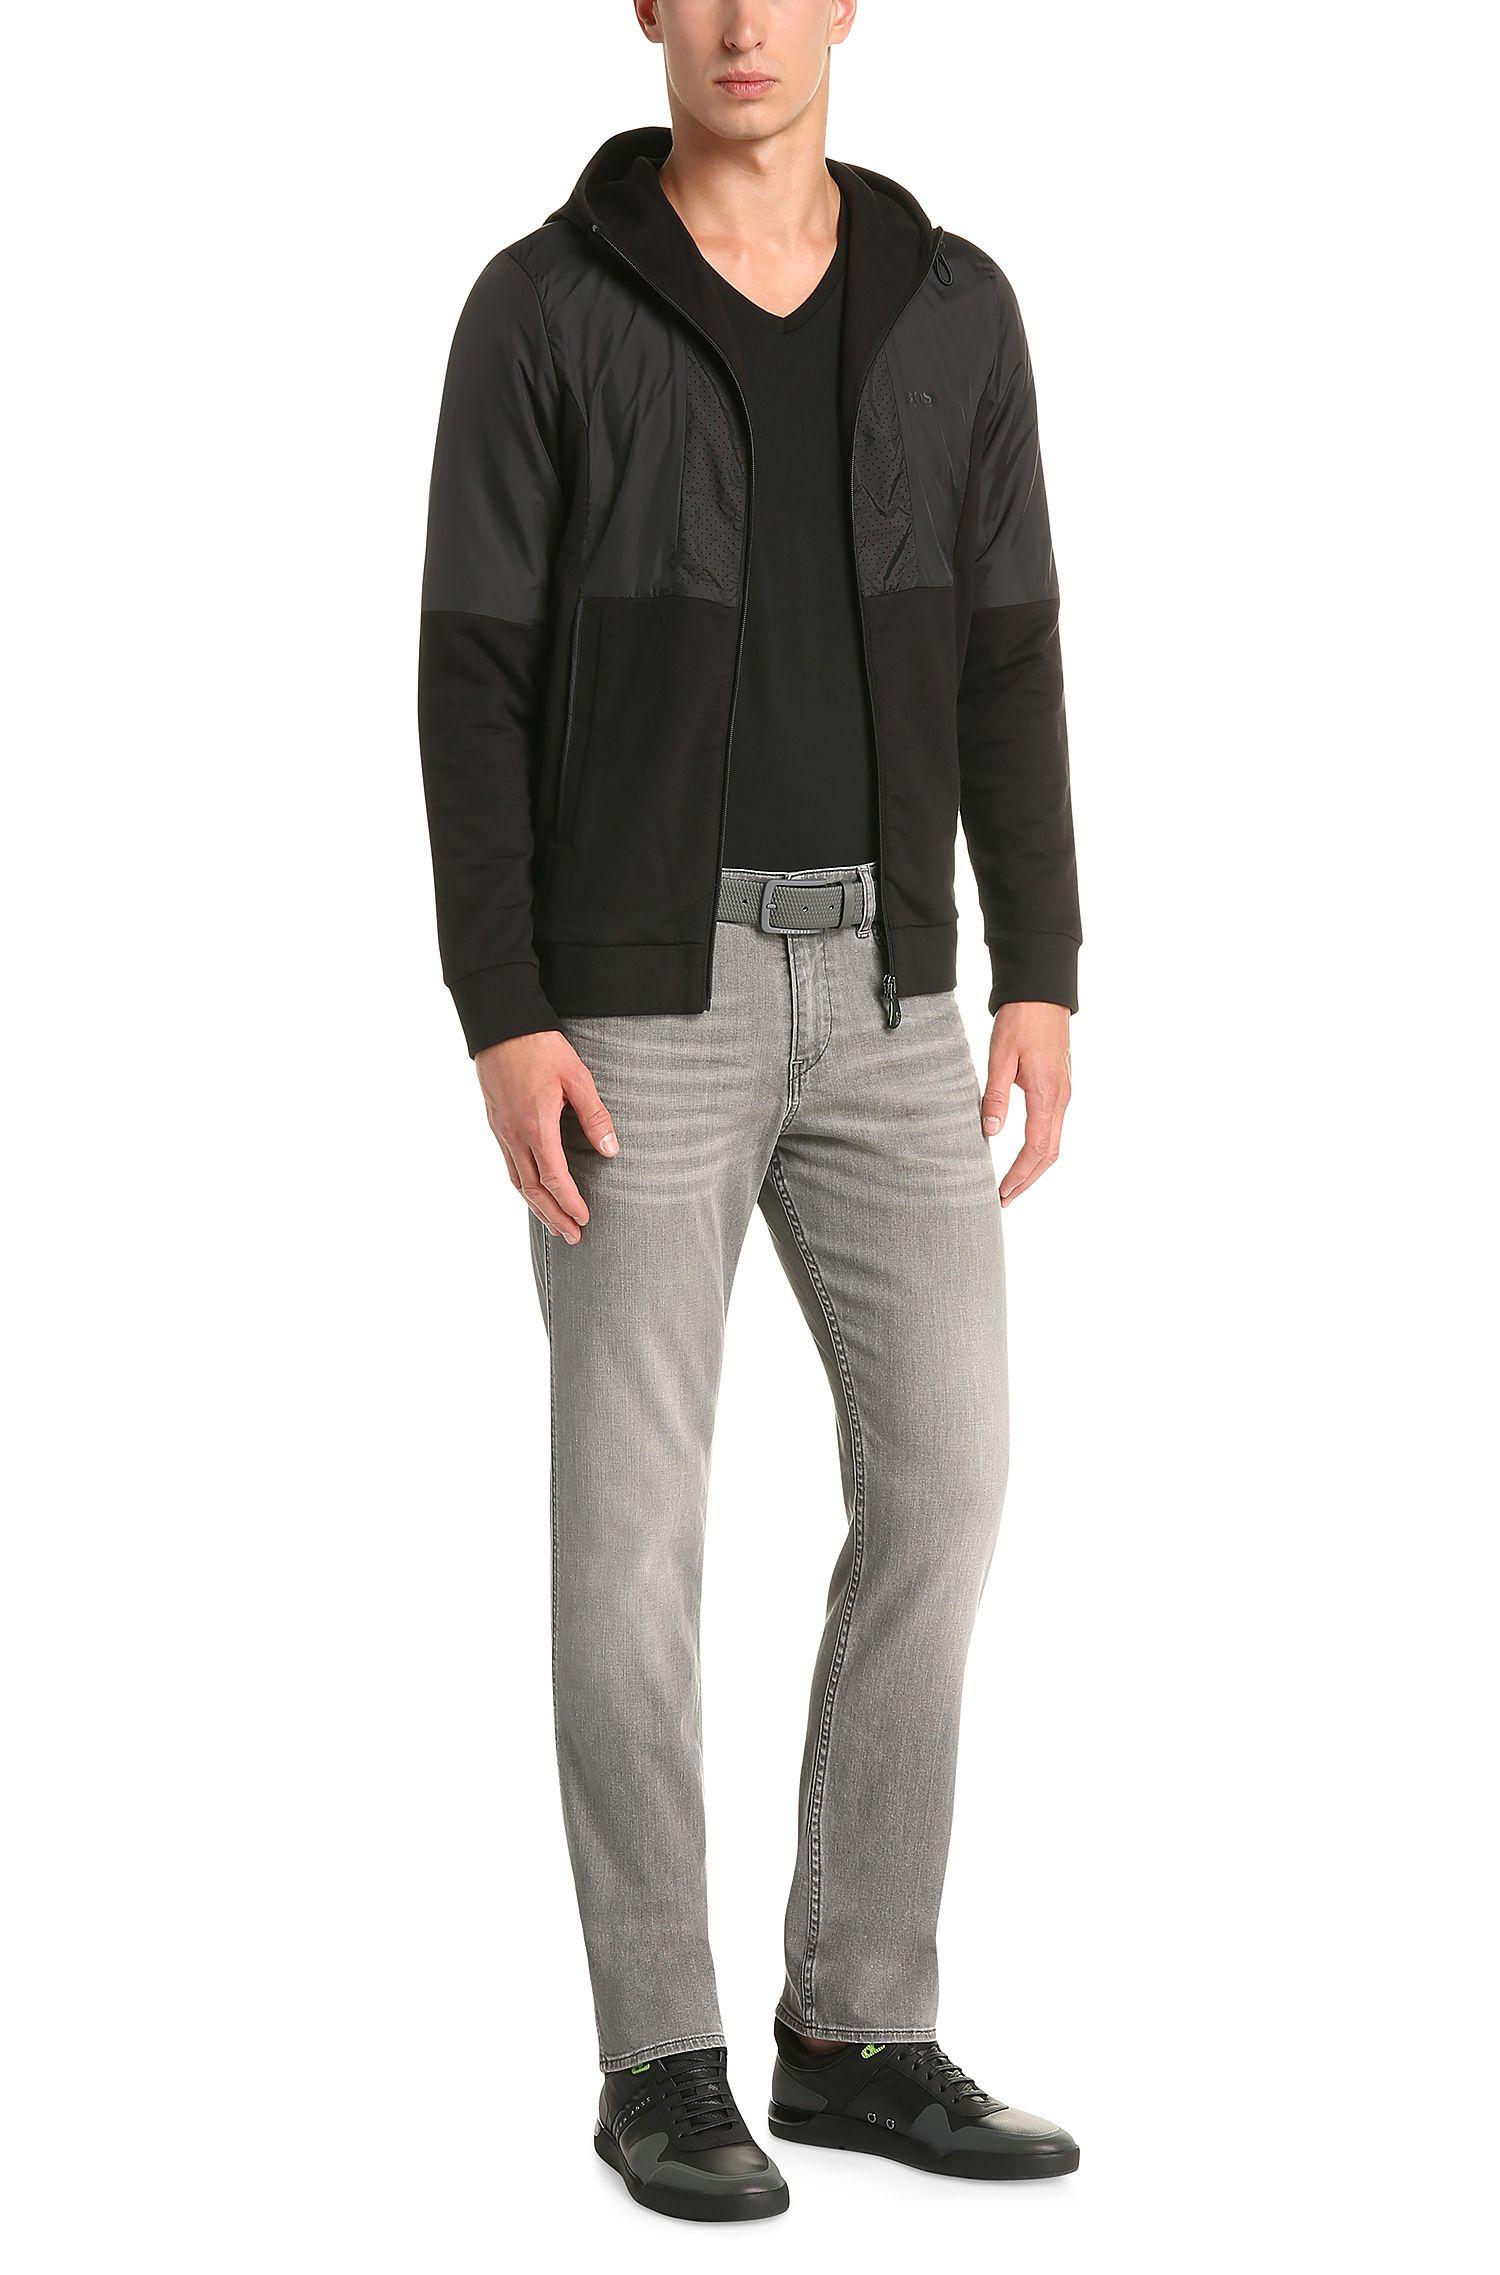 Leather Textured Belt | Teres Sz35 Item